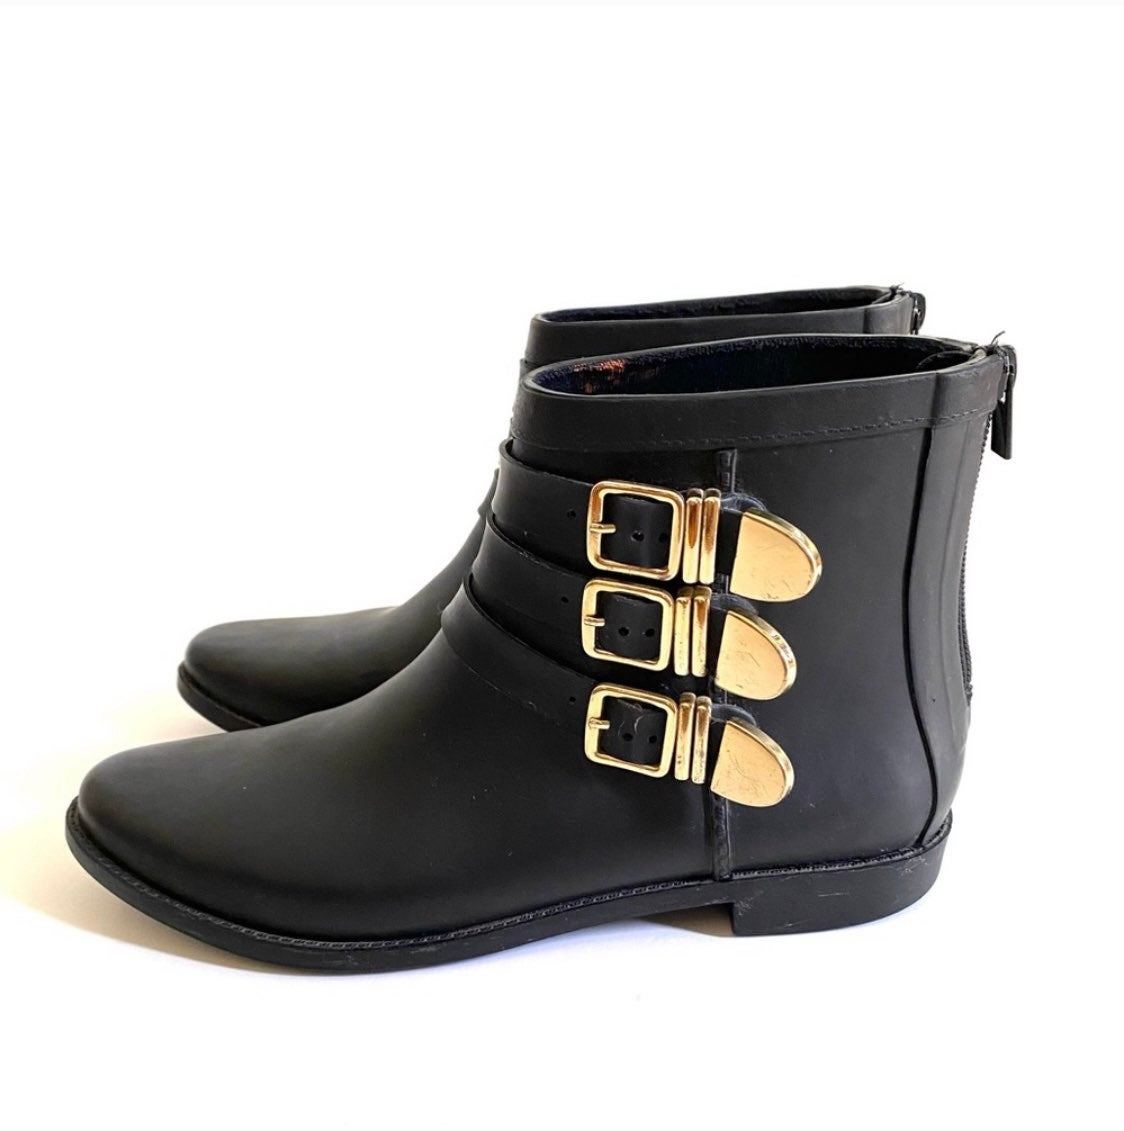 LOEFFLER RANDALL Black Rain Boots